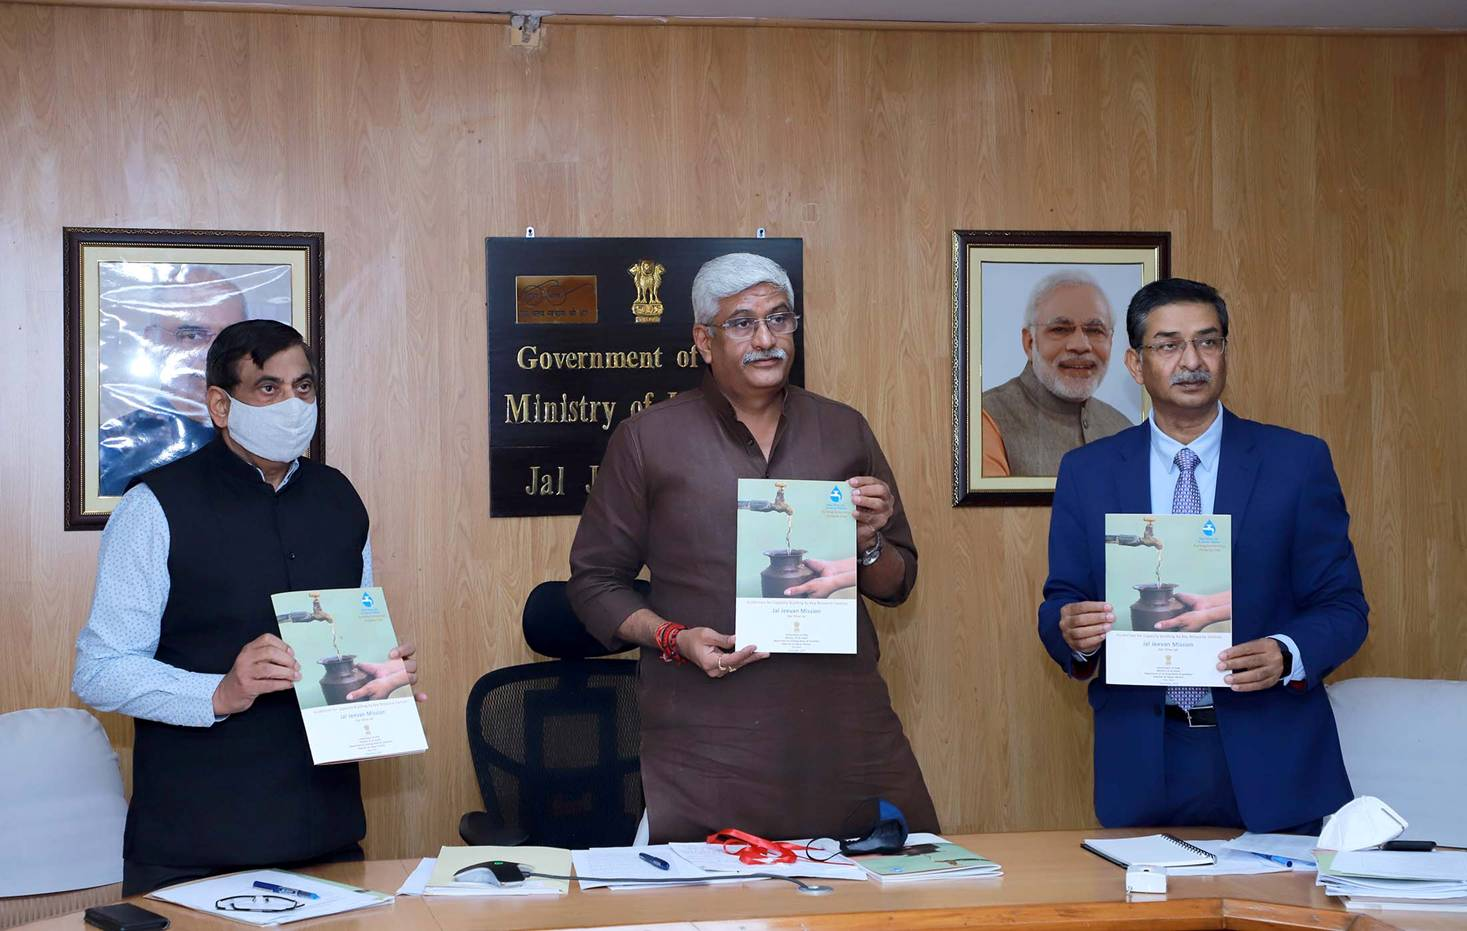 Union Jal Shakti Minister reviews progress of Jal Jeevan Mission